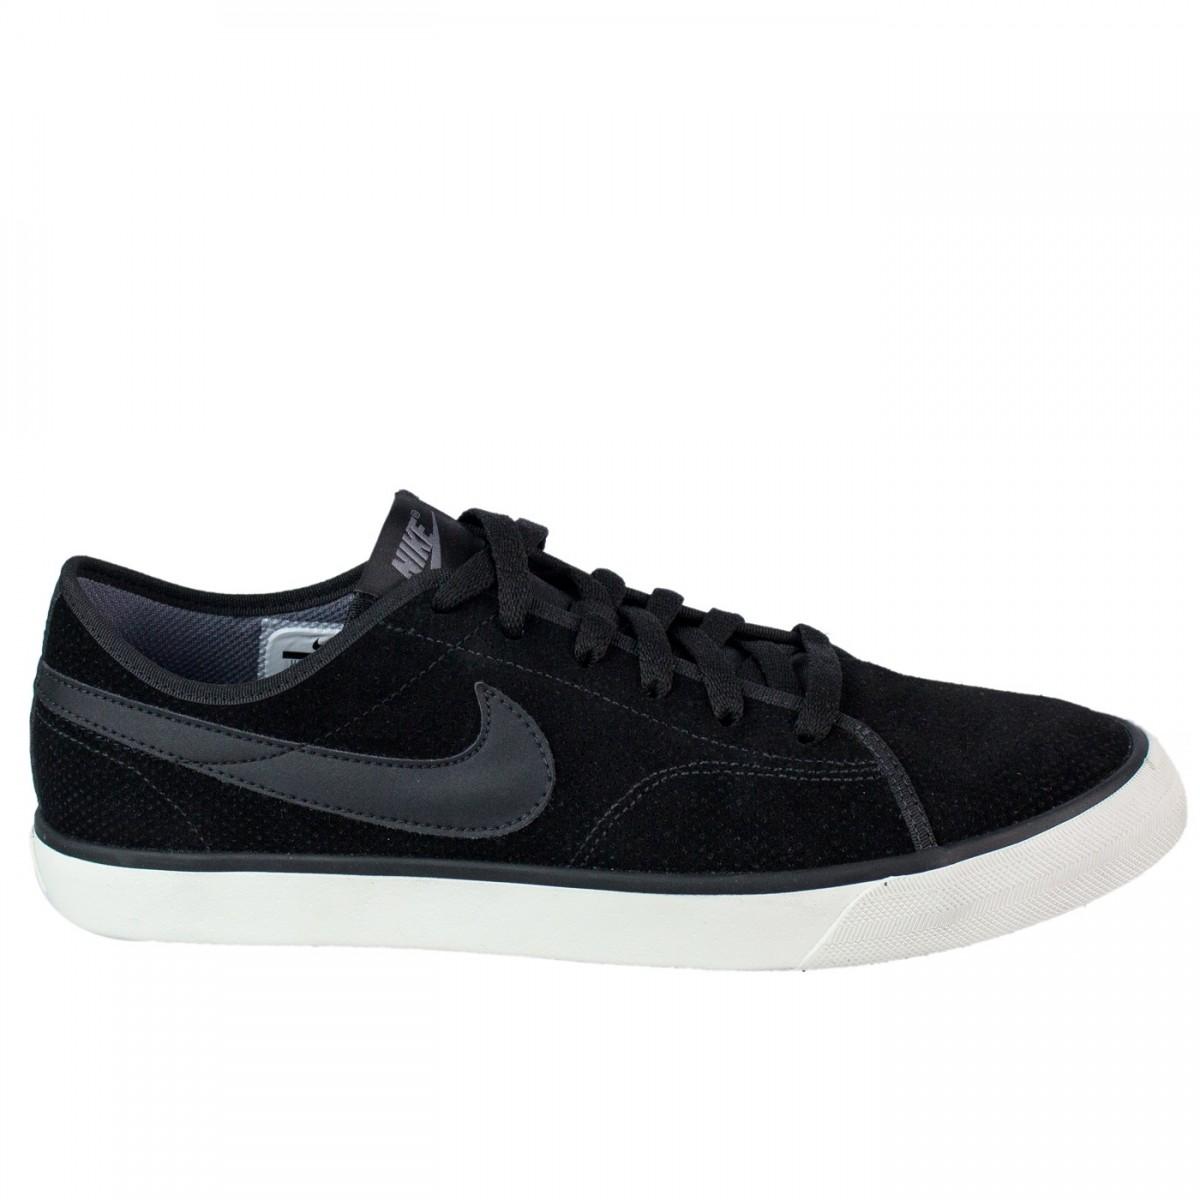 Bizz Store - Tênis Masculino Nike Primo Court Leather Preto b7114e83ff7b1